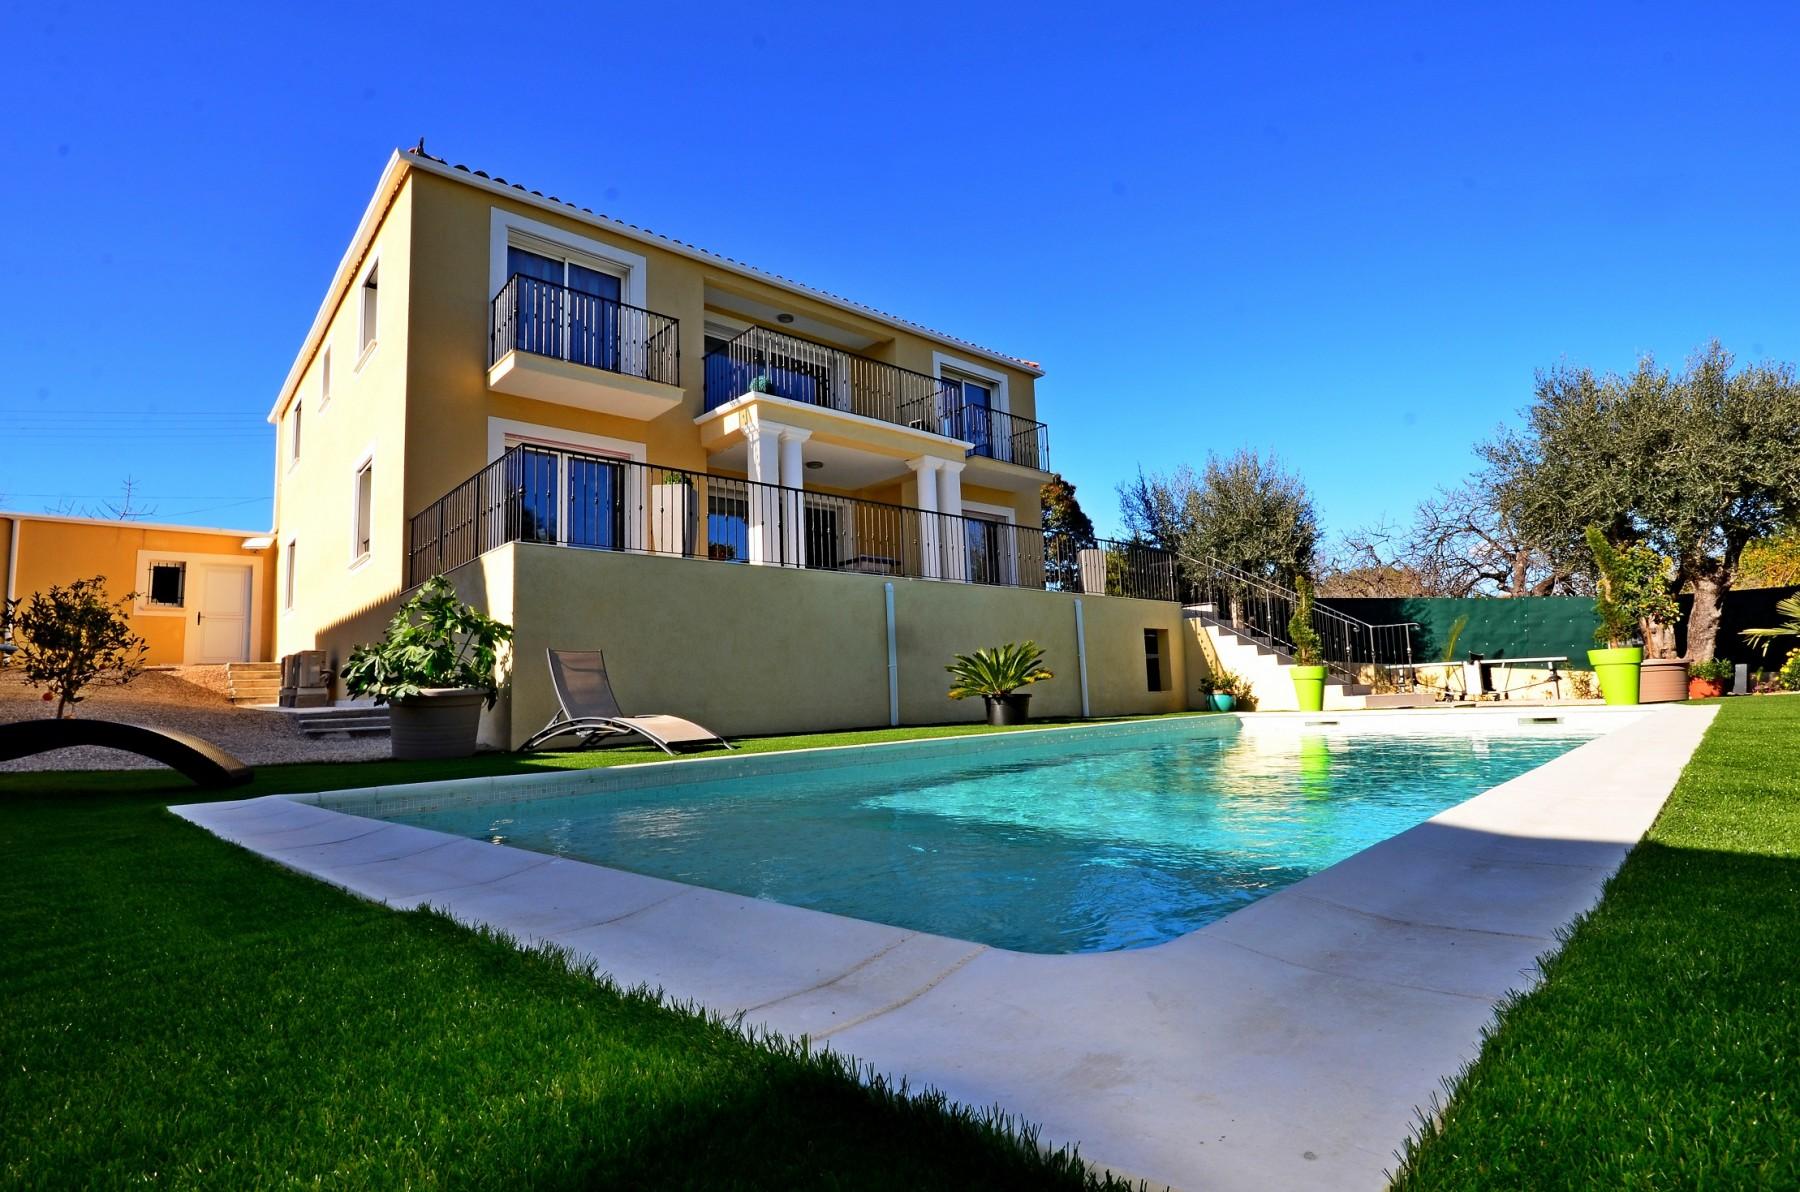 Belle villa avec piscine villeneuve loubet for Piscine villeneuve loubet